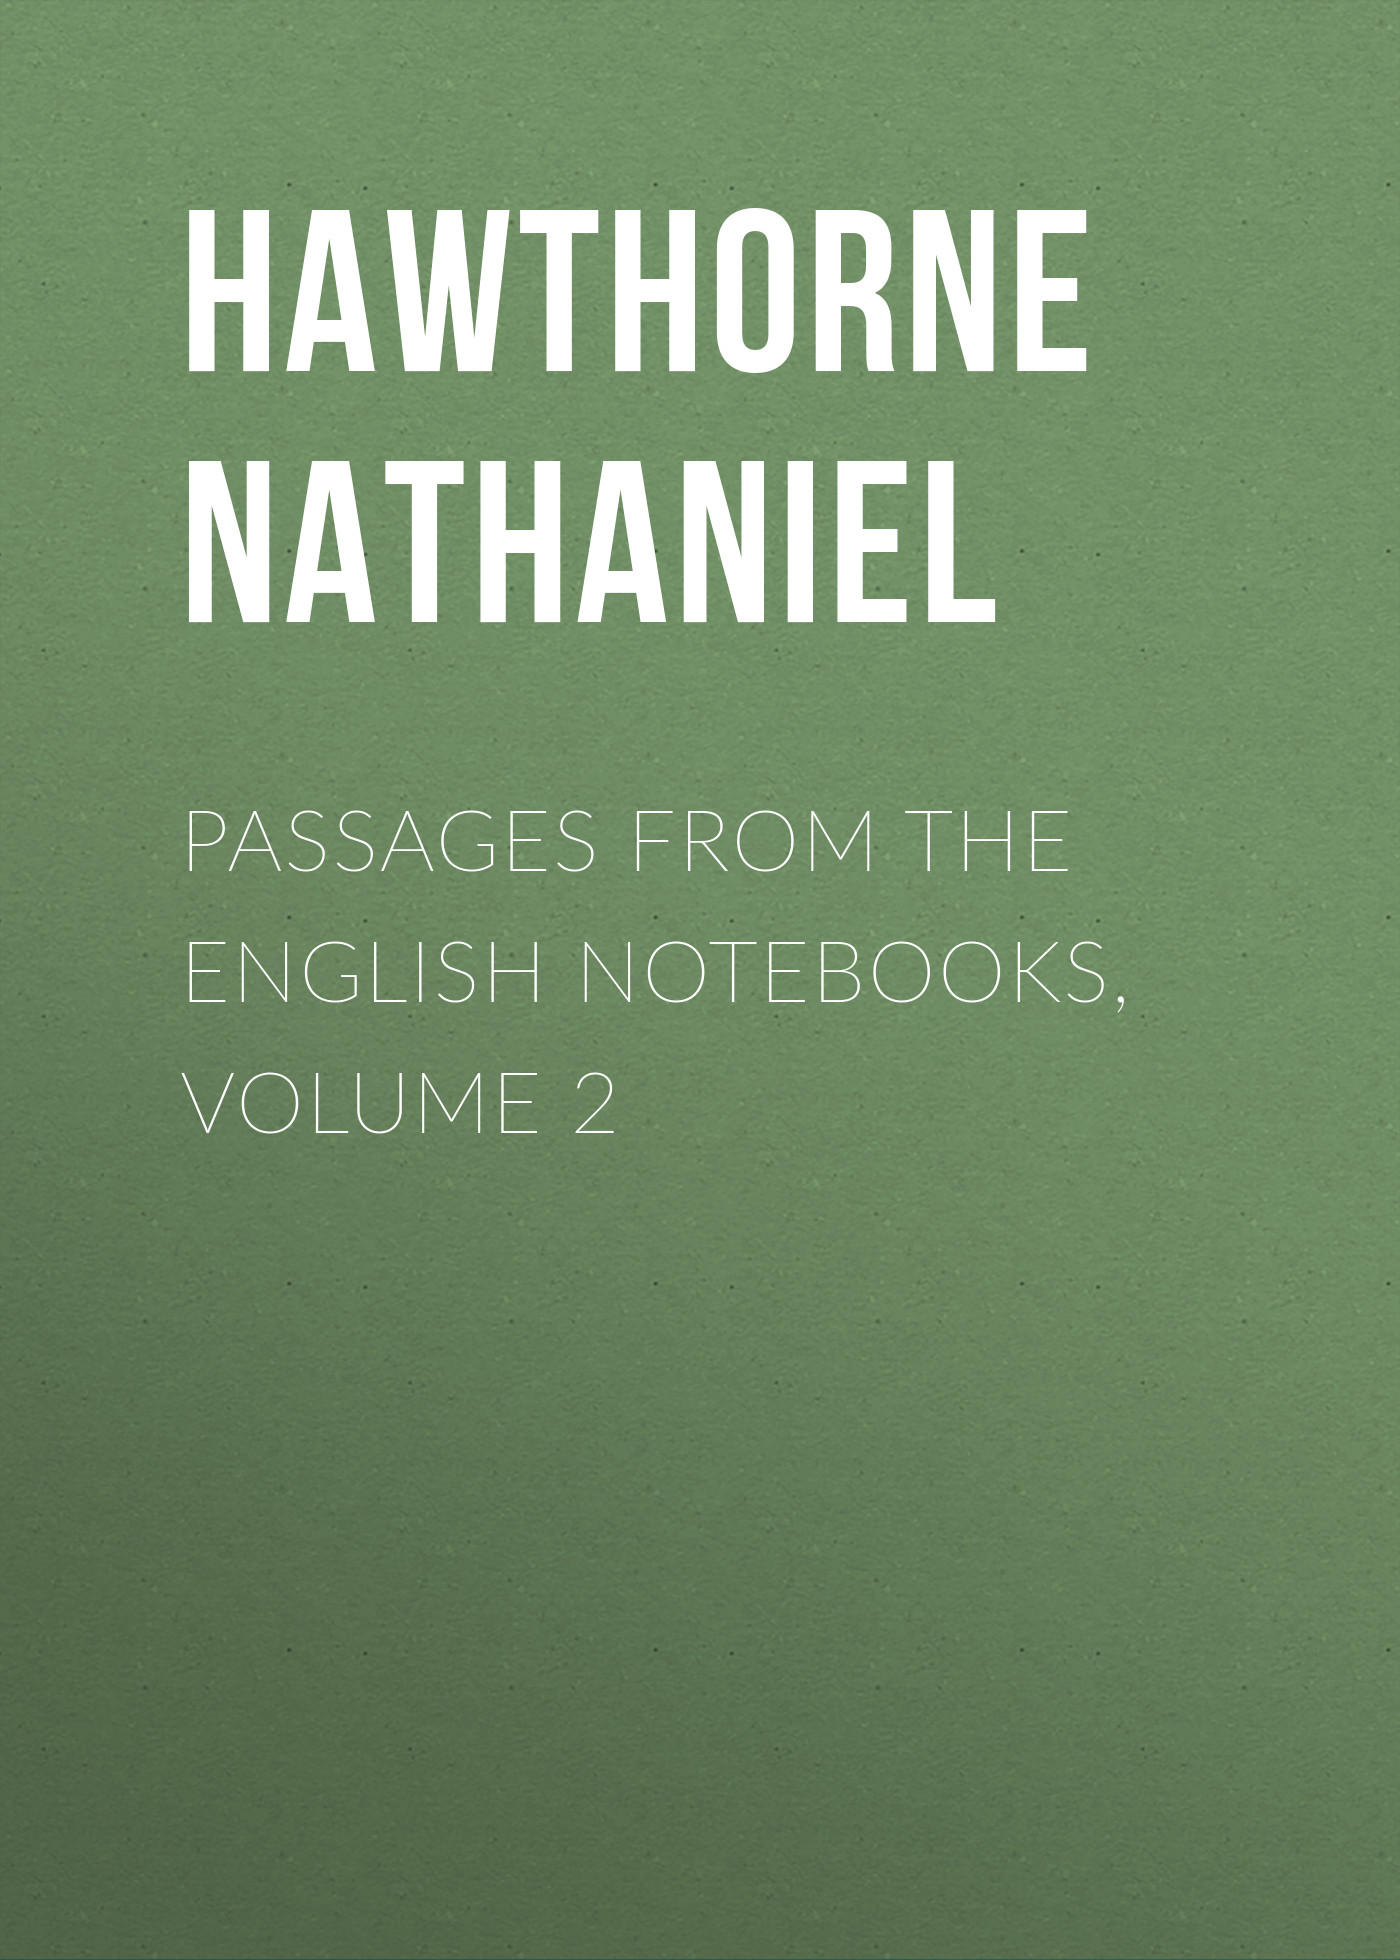 лучшая цена Hawthorne Nathaniel Passages from the English Notebooks, Volume 2